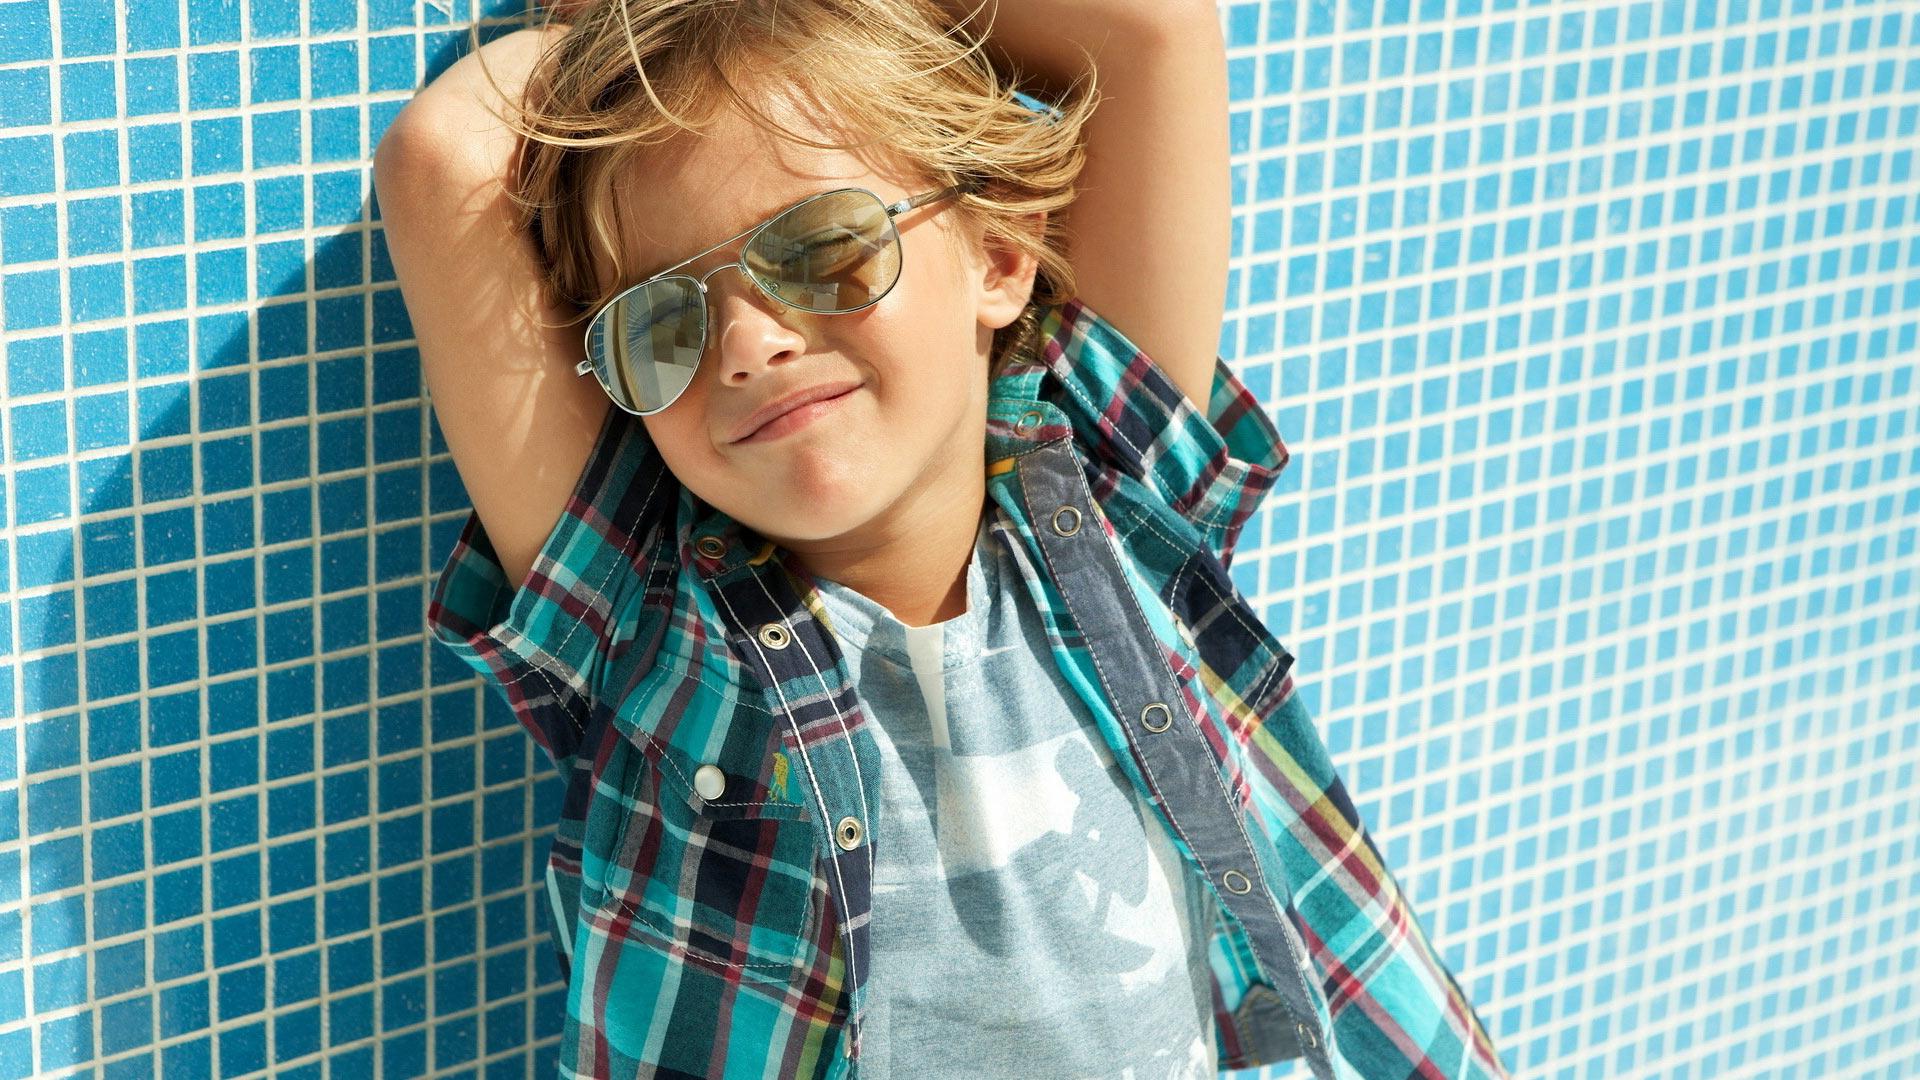 Фото ребенок 11 лет летом